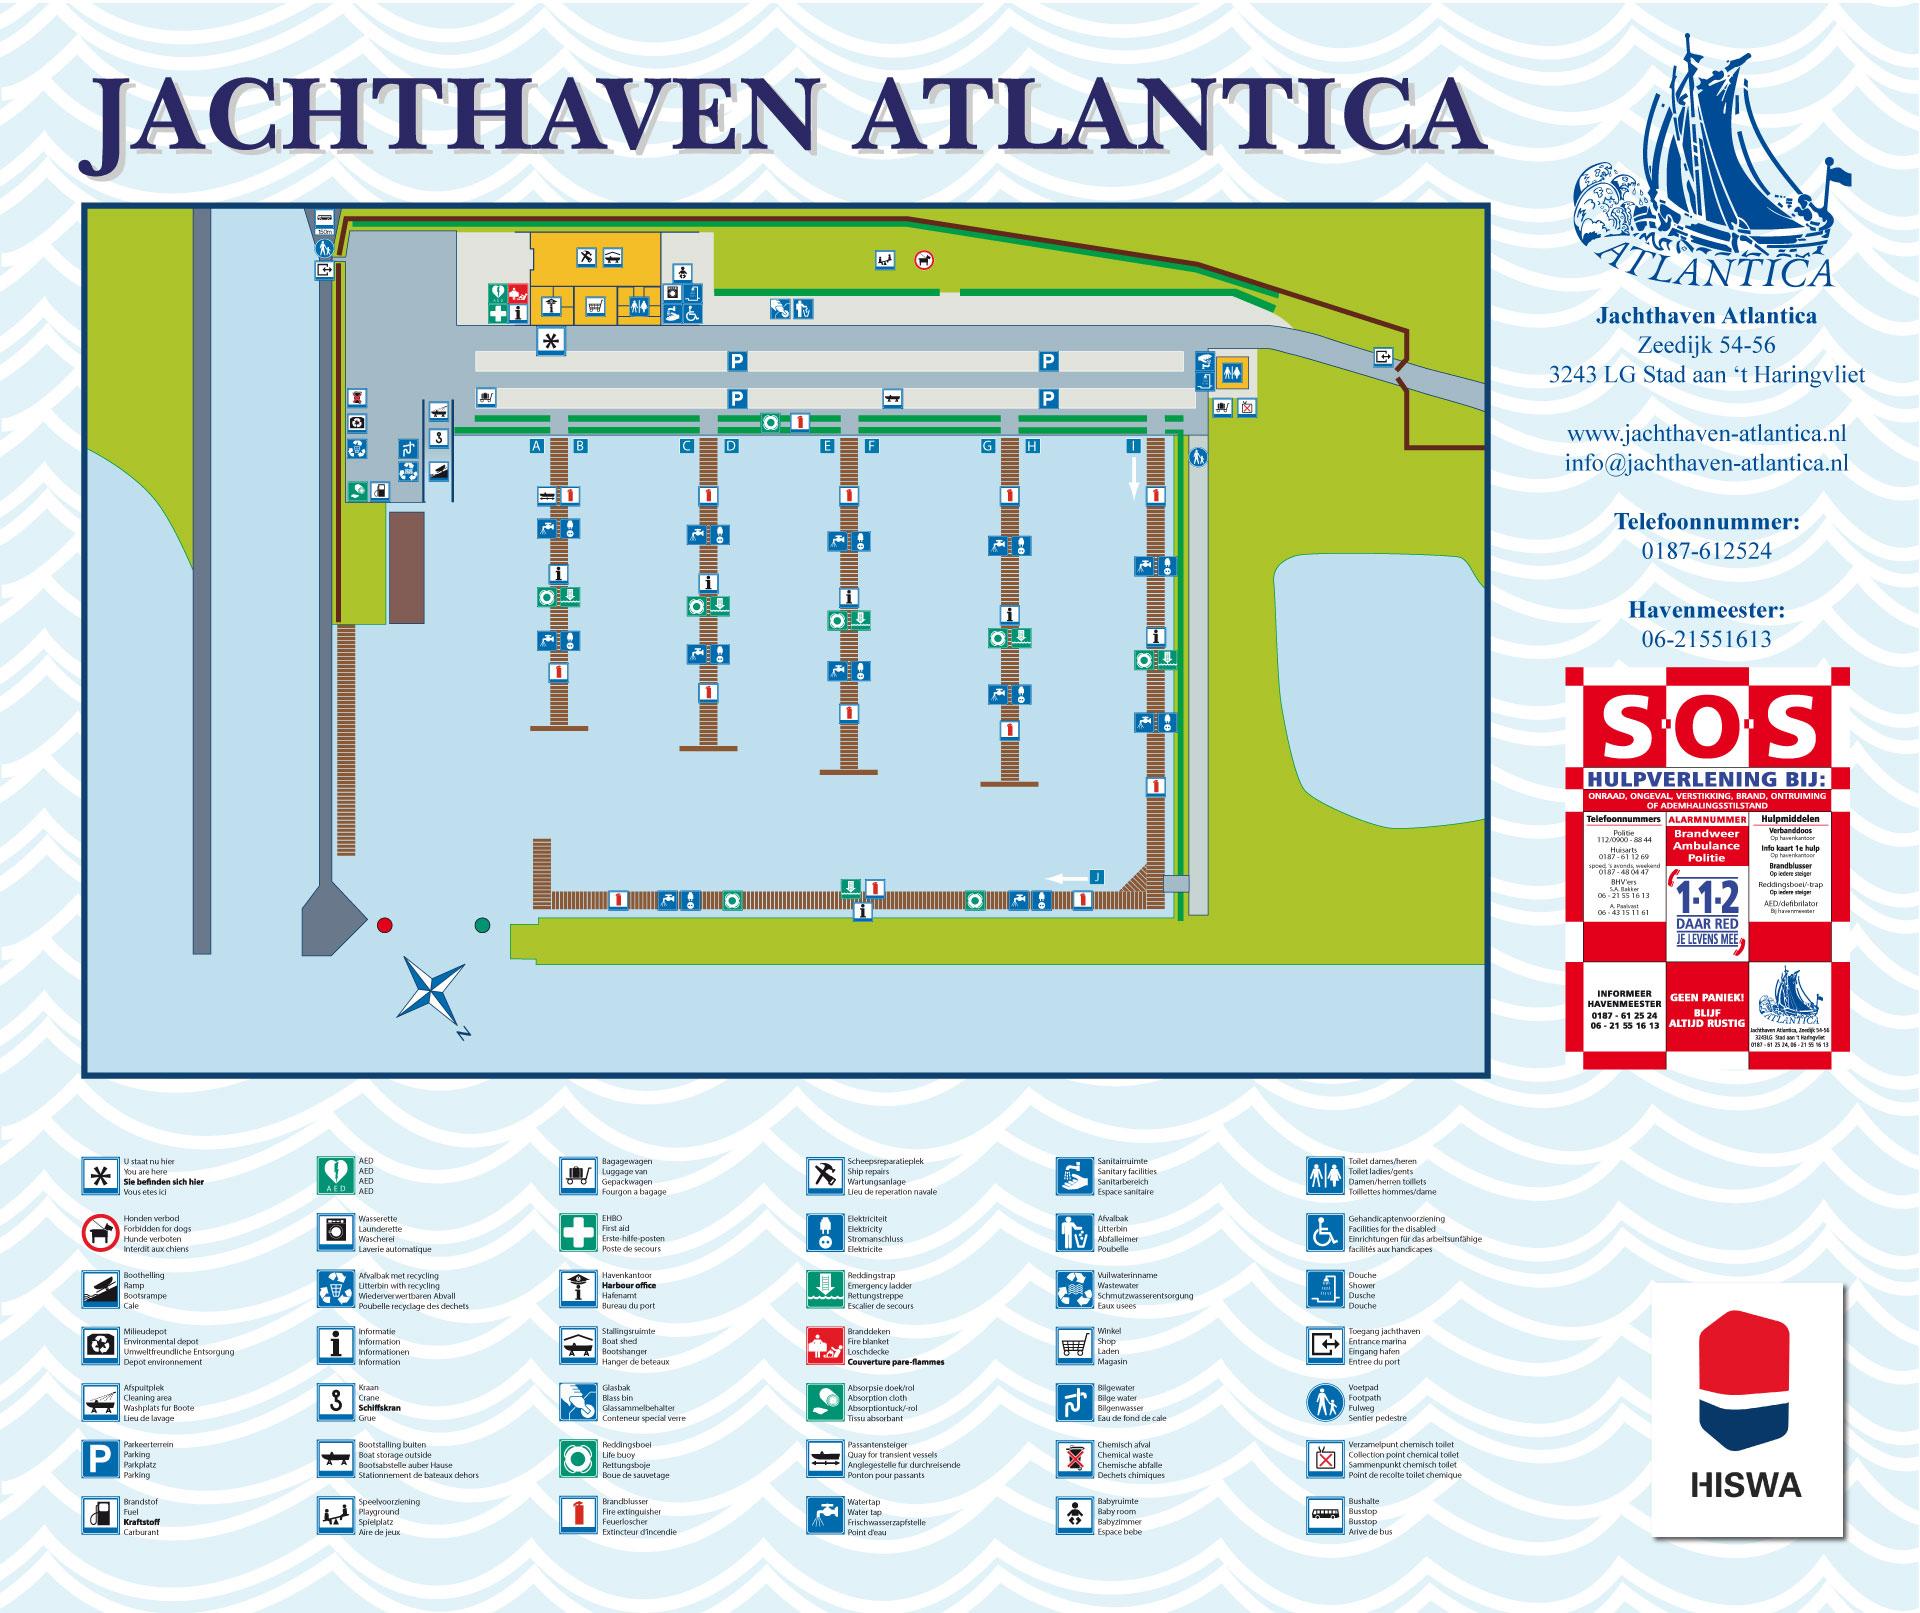 Jachthaven_atlantica_plattegrond02_golven